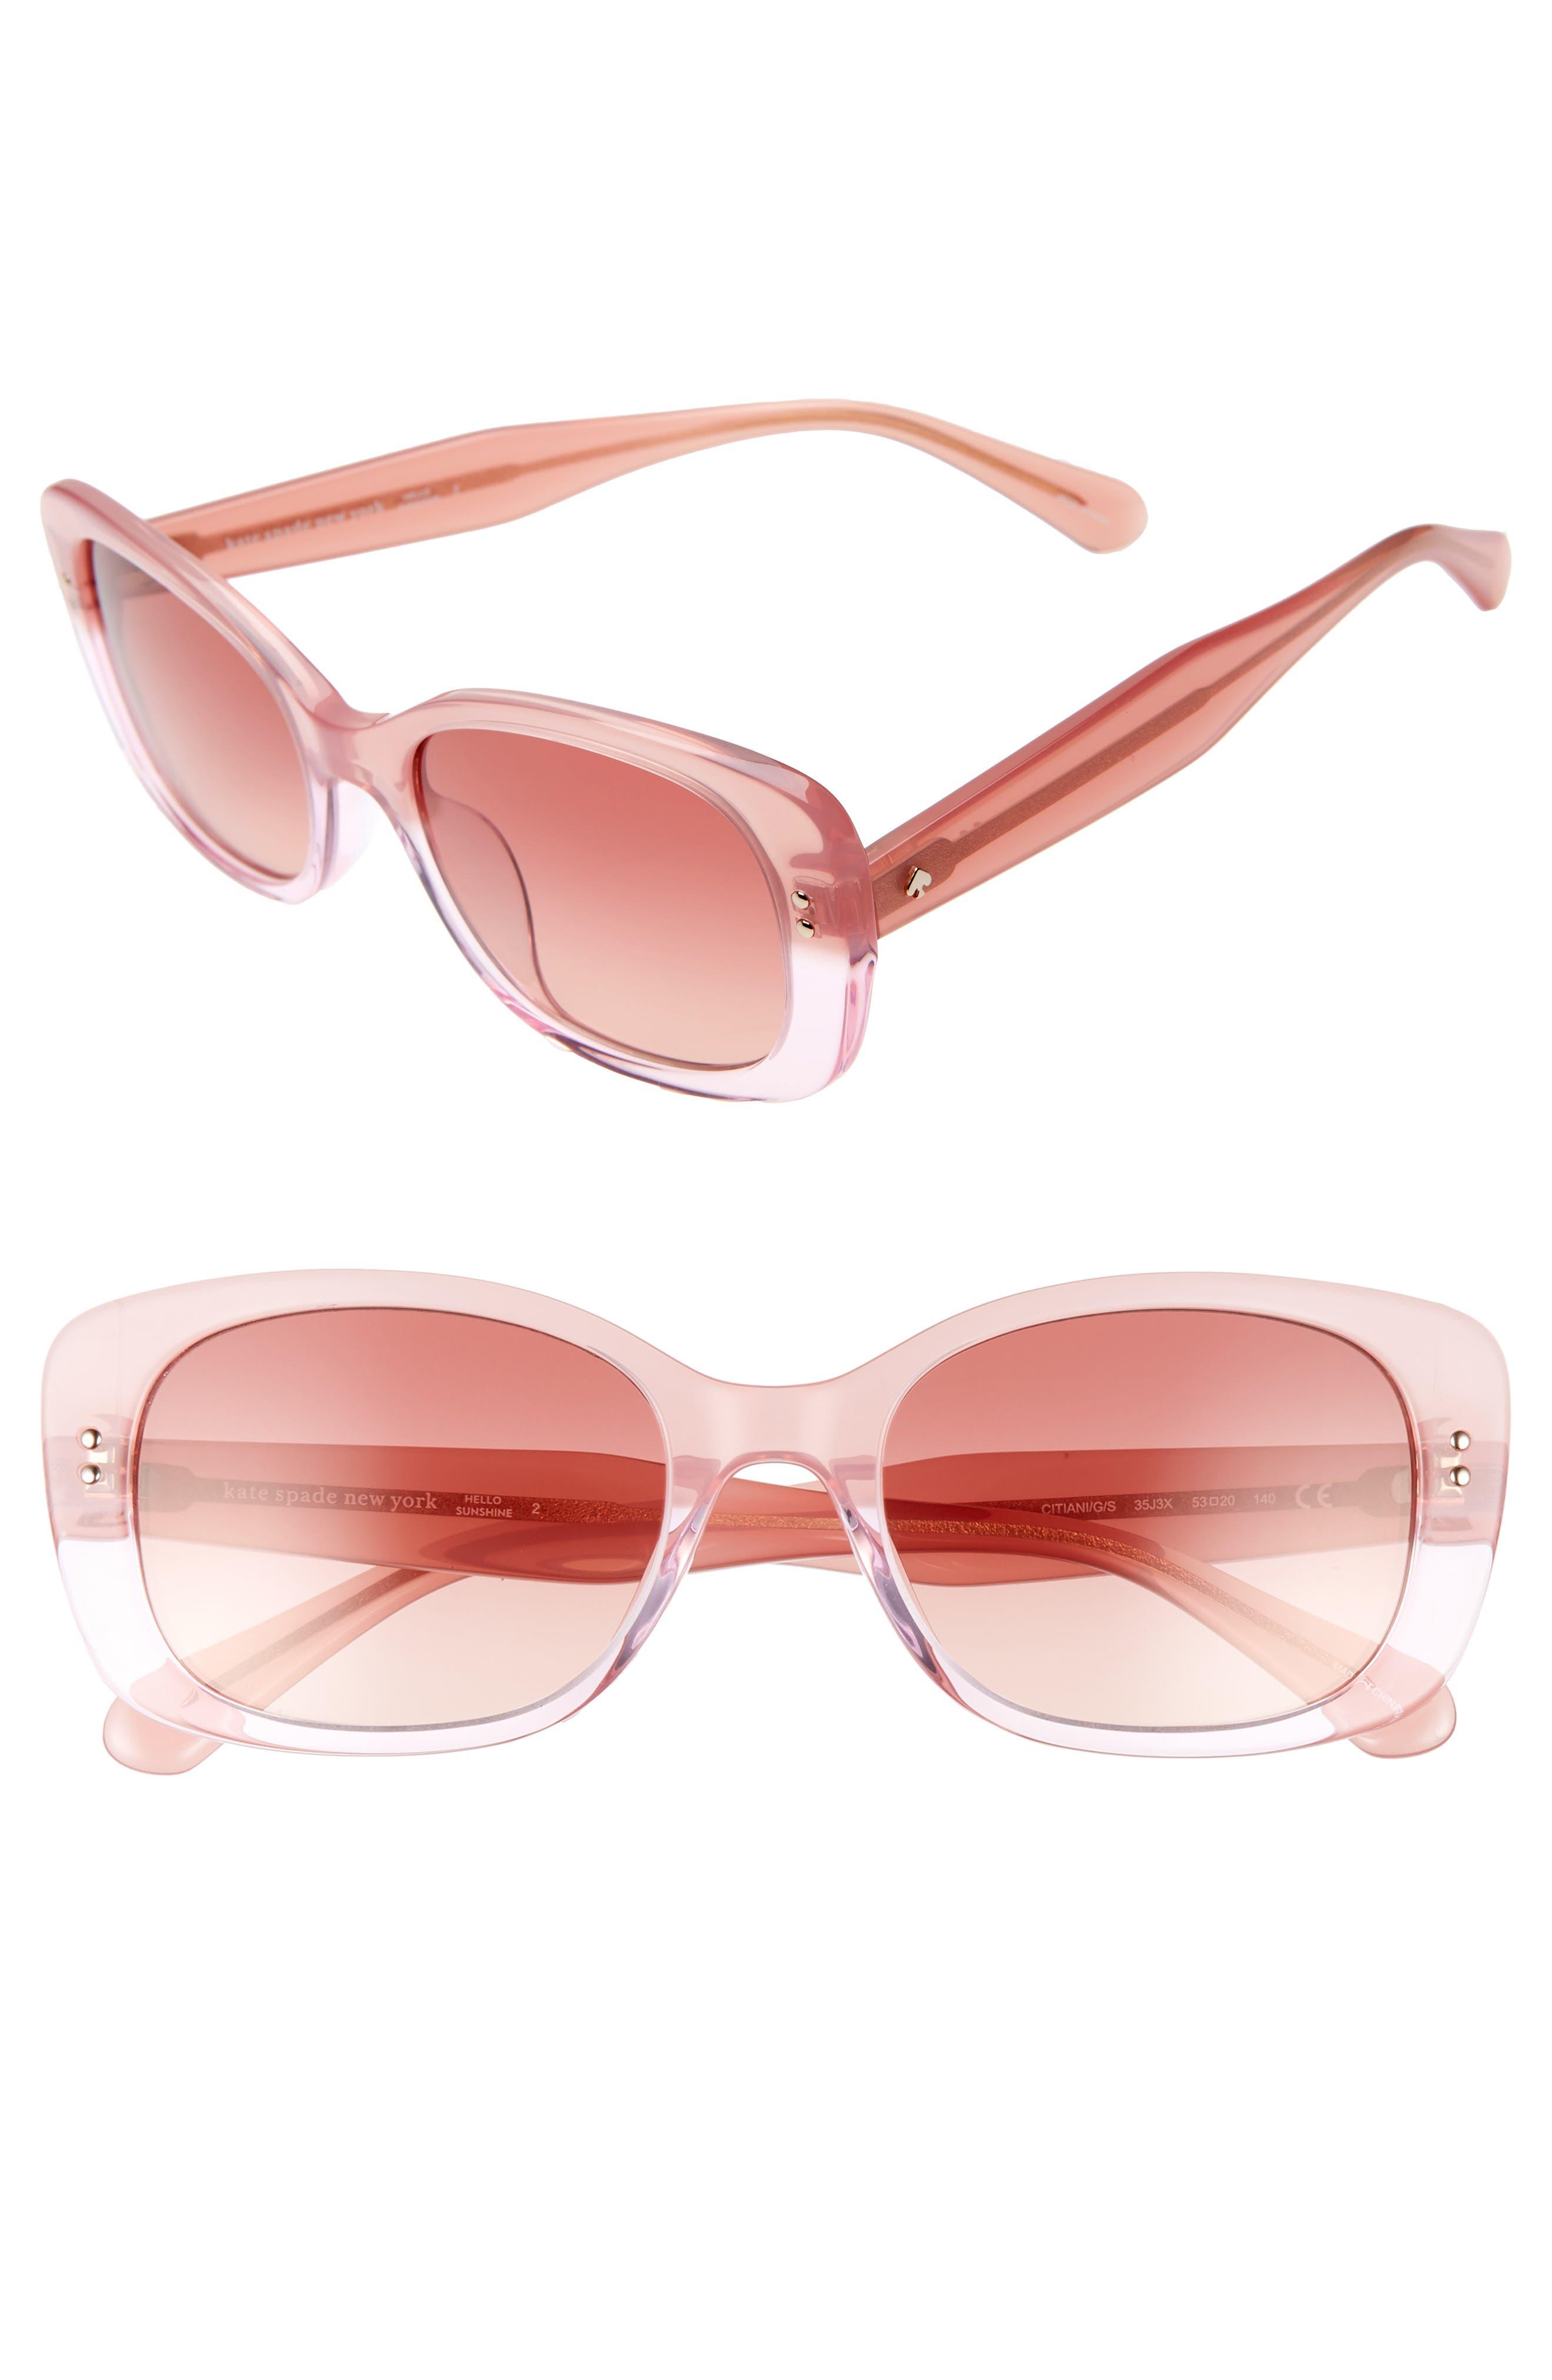 3f1a6b39a9994 Pink kate spade new york Sunglasses   Eyewear